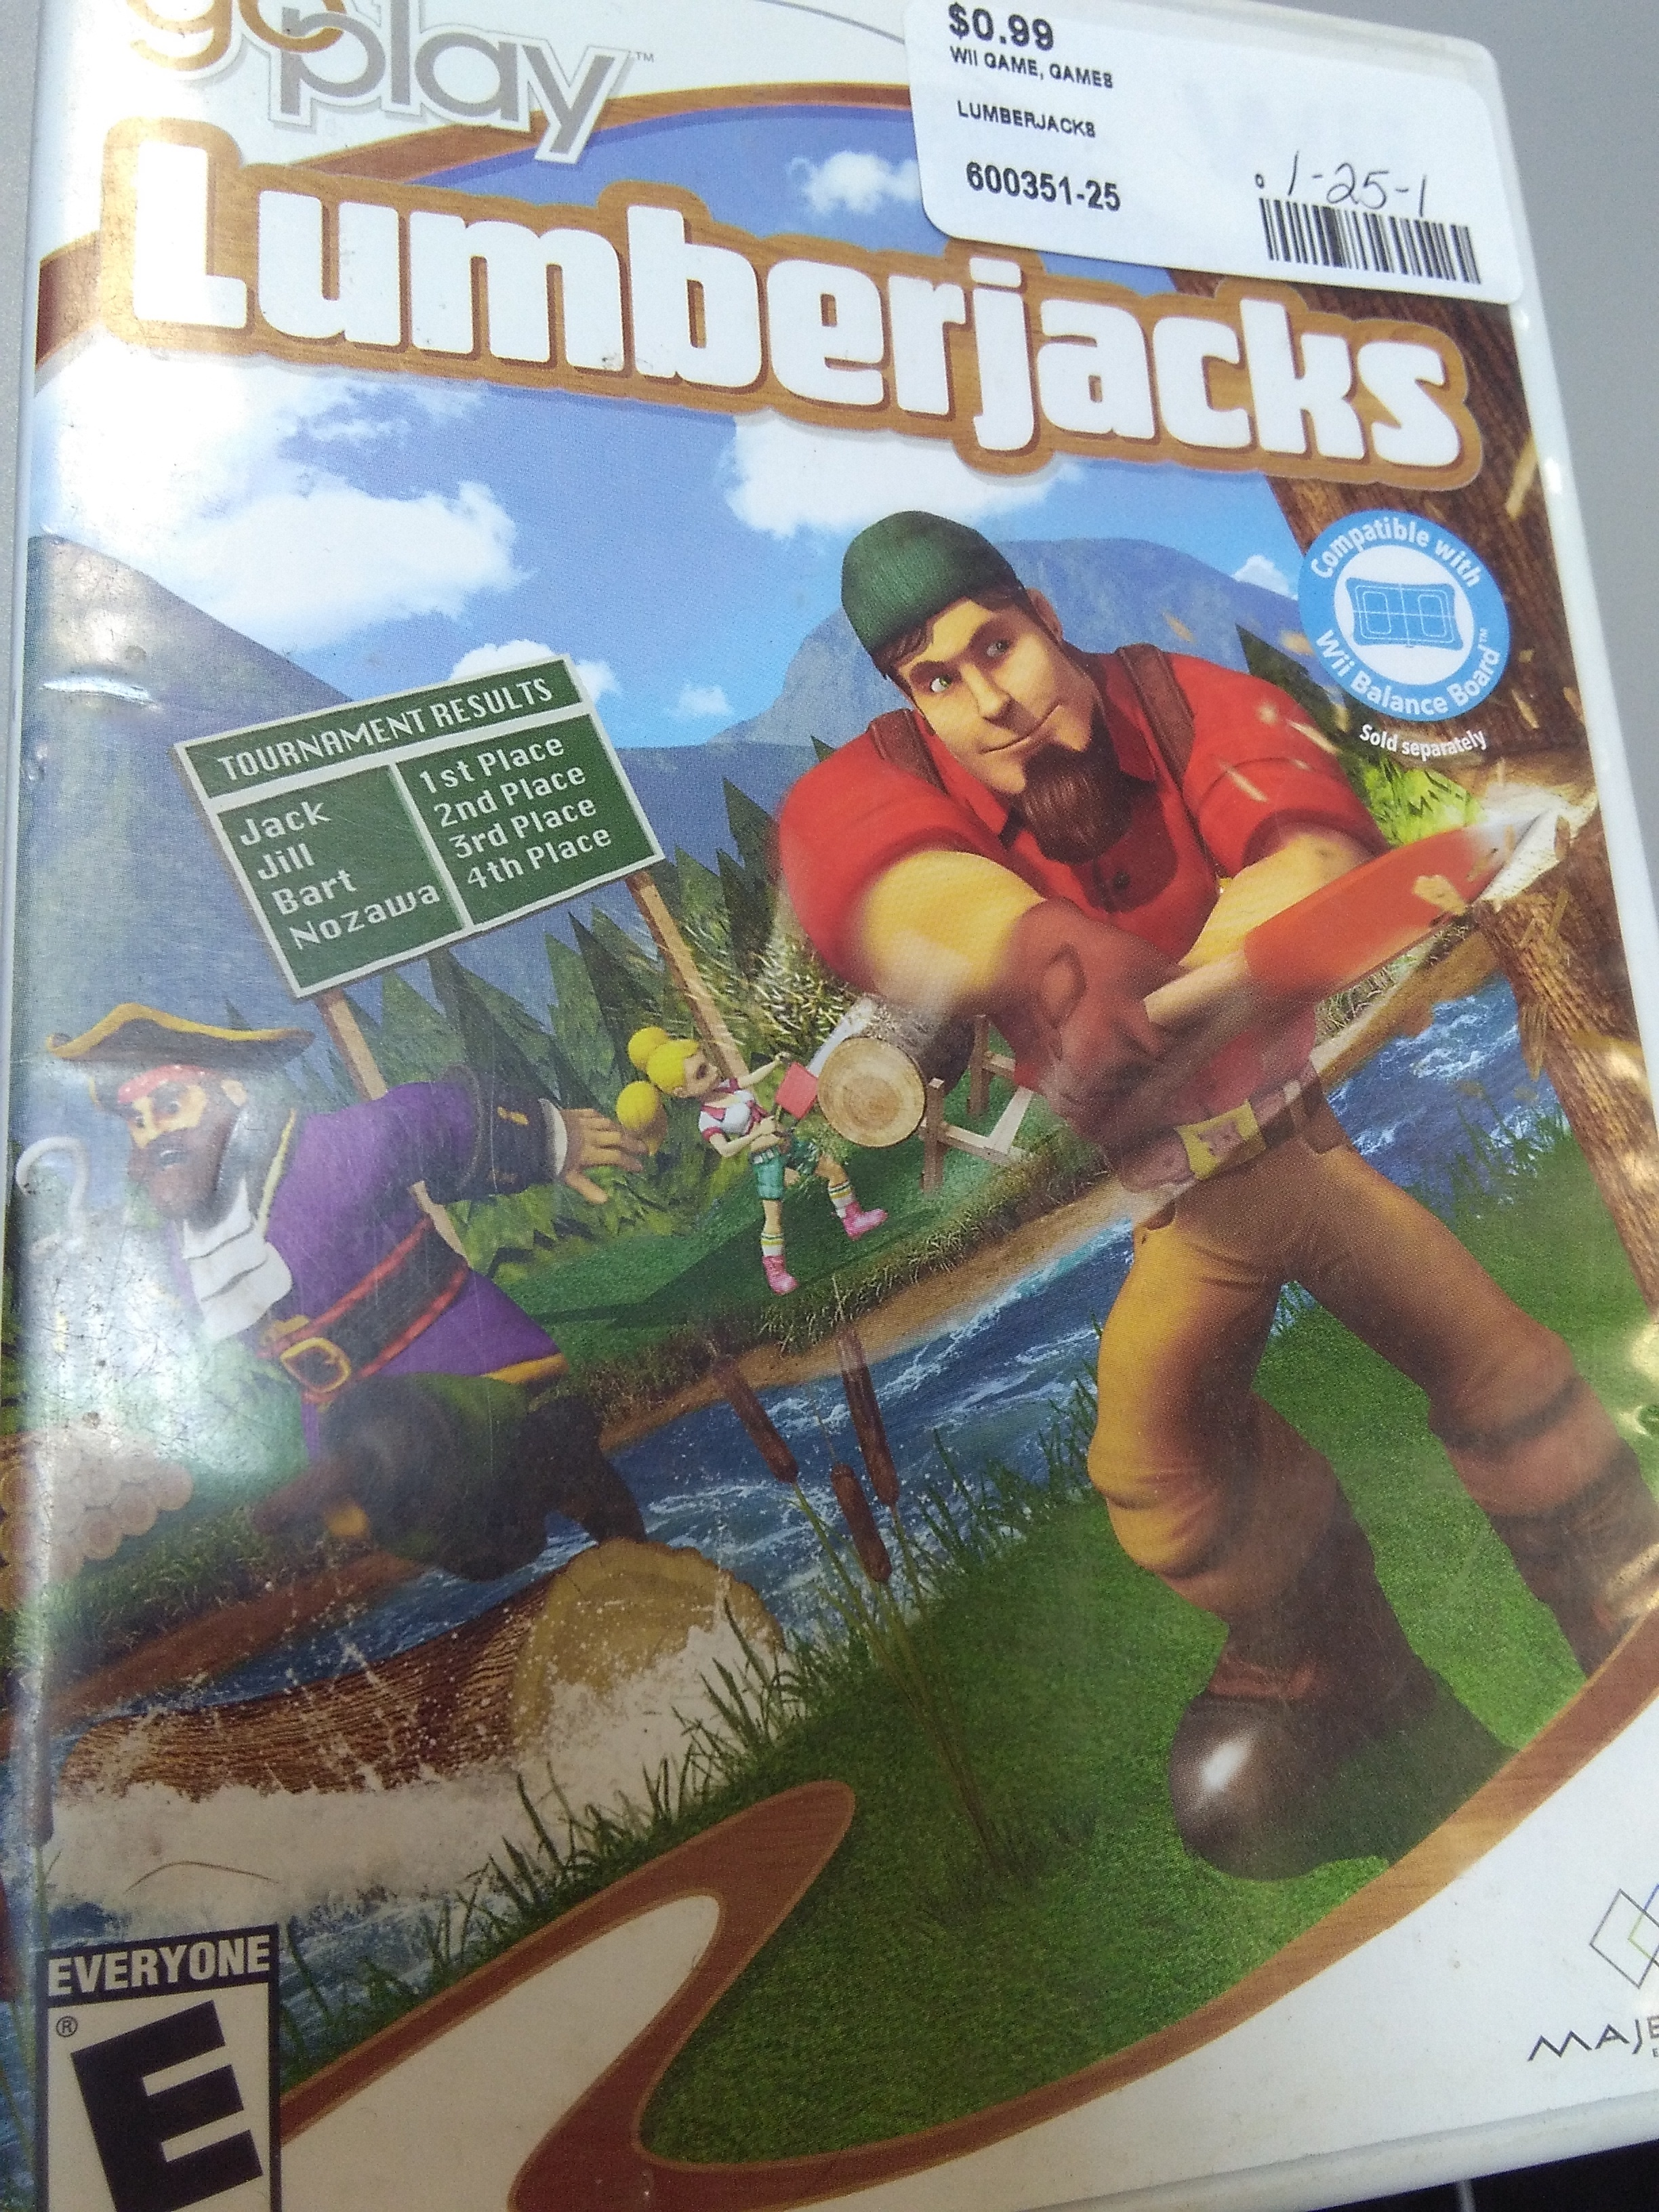 LUMBERJACKS WII GAME